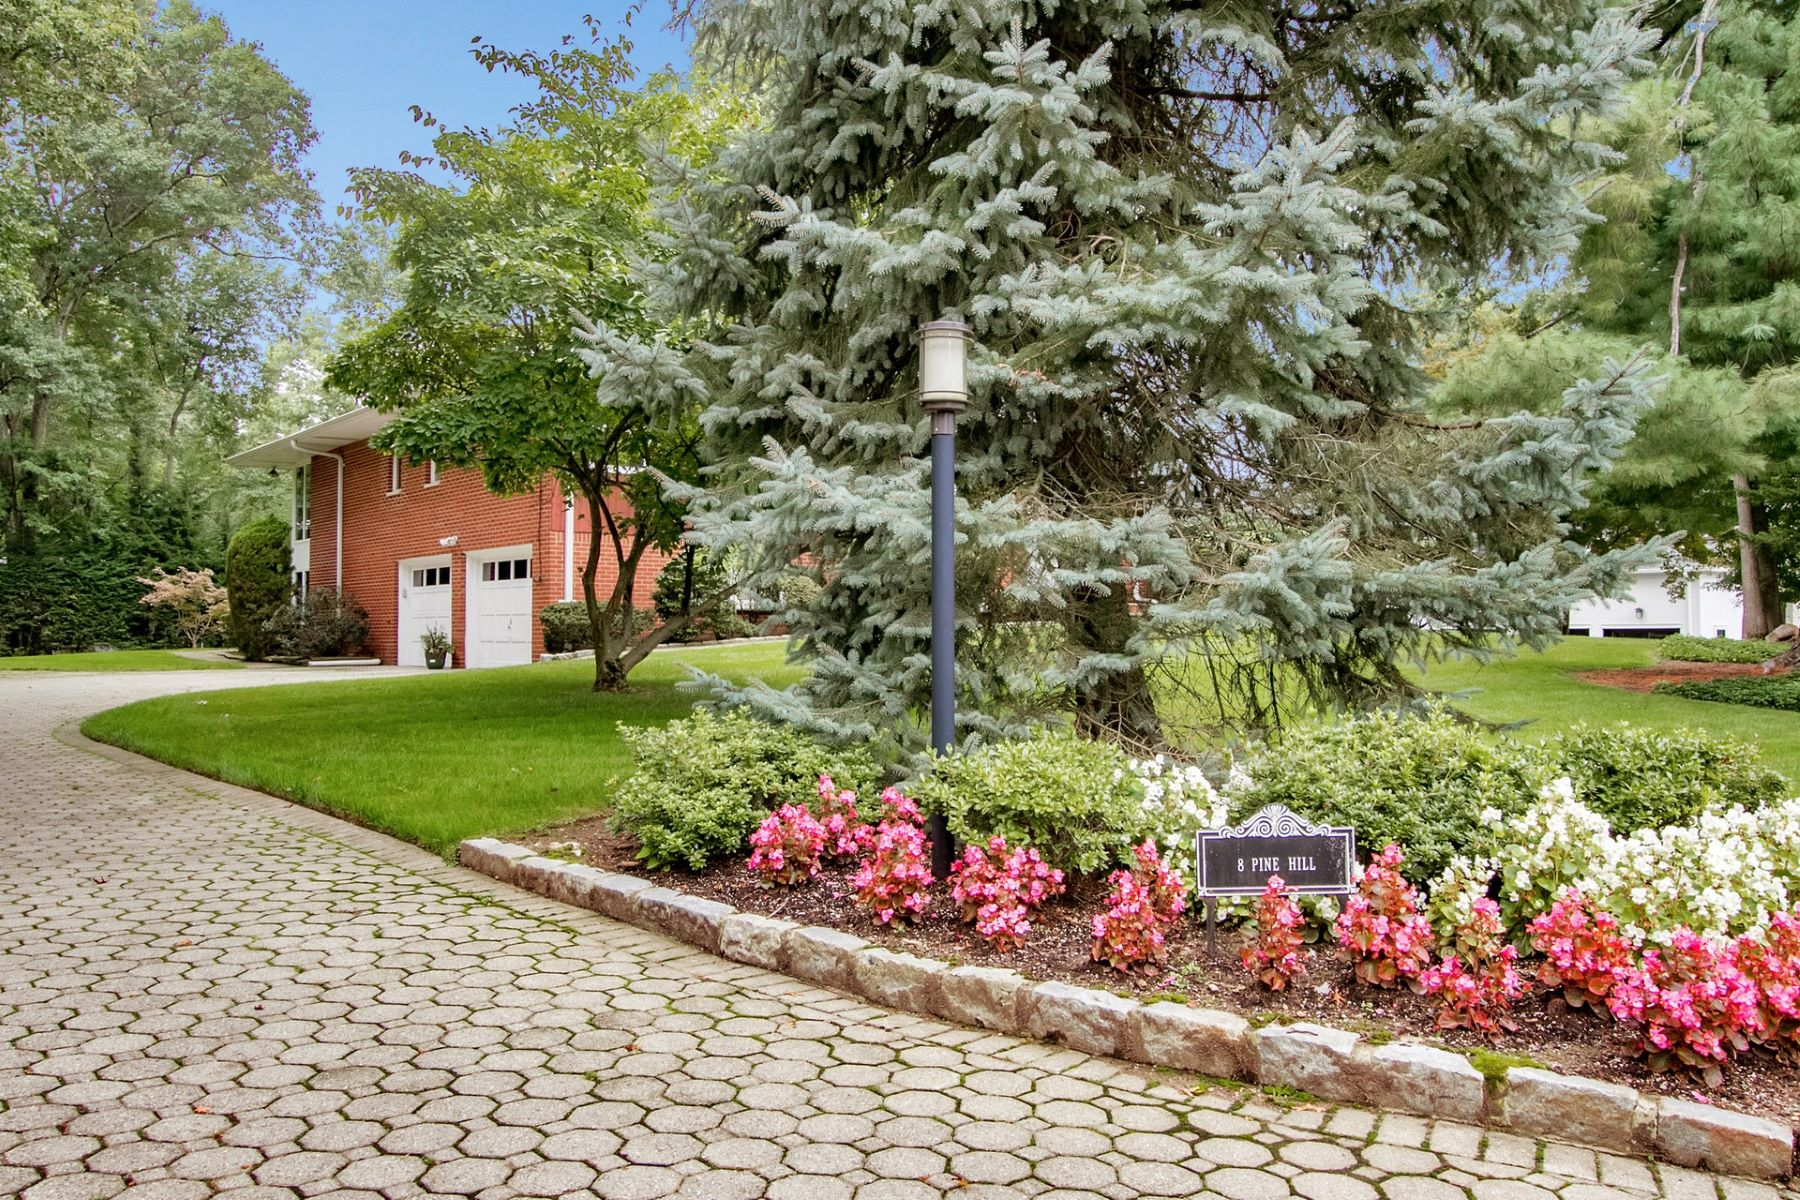 single family homes для того Продажа на East Hill 8 Pine Hill Road, Demarest, Нью-Джерси 07627 Соединенные Штаты